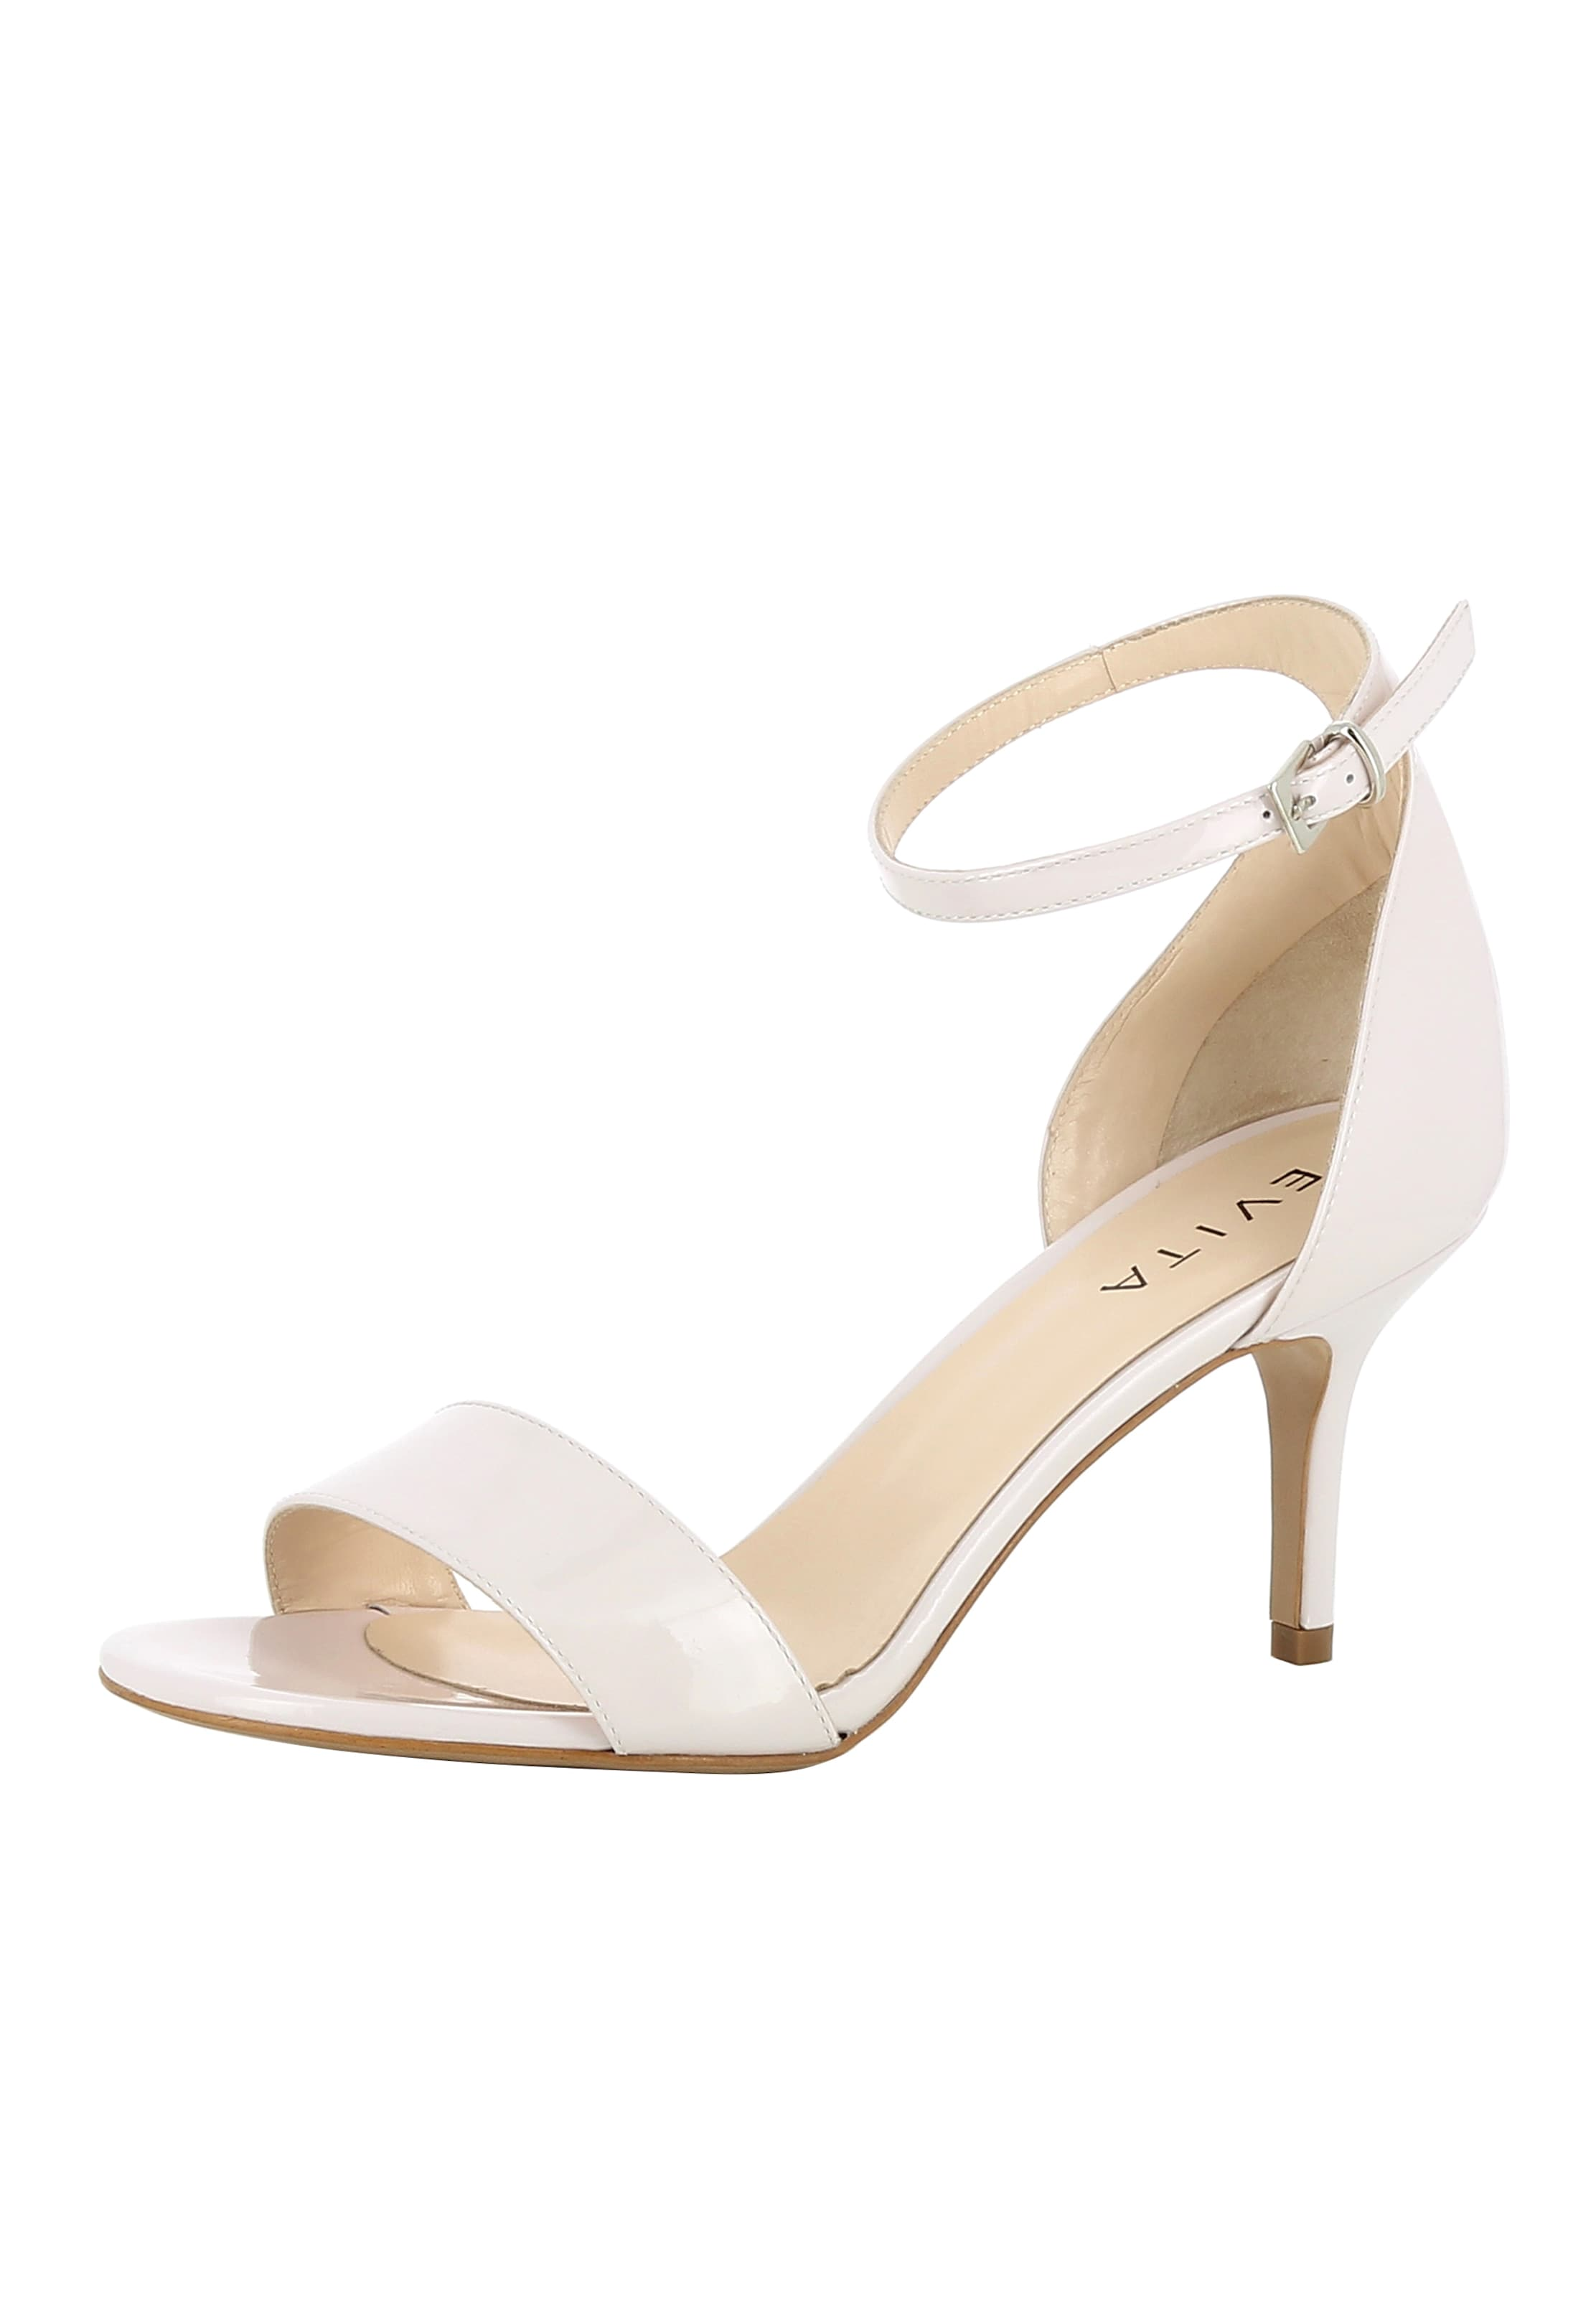 Sandalette Evita 'veronica' 'veronica' Beige Beige In Evita Sandalette Evita Sandalette In XOiukZP